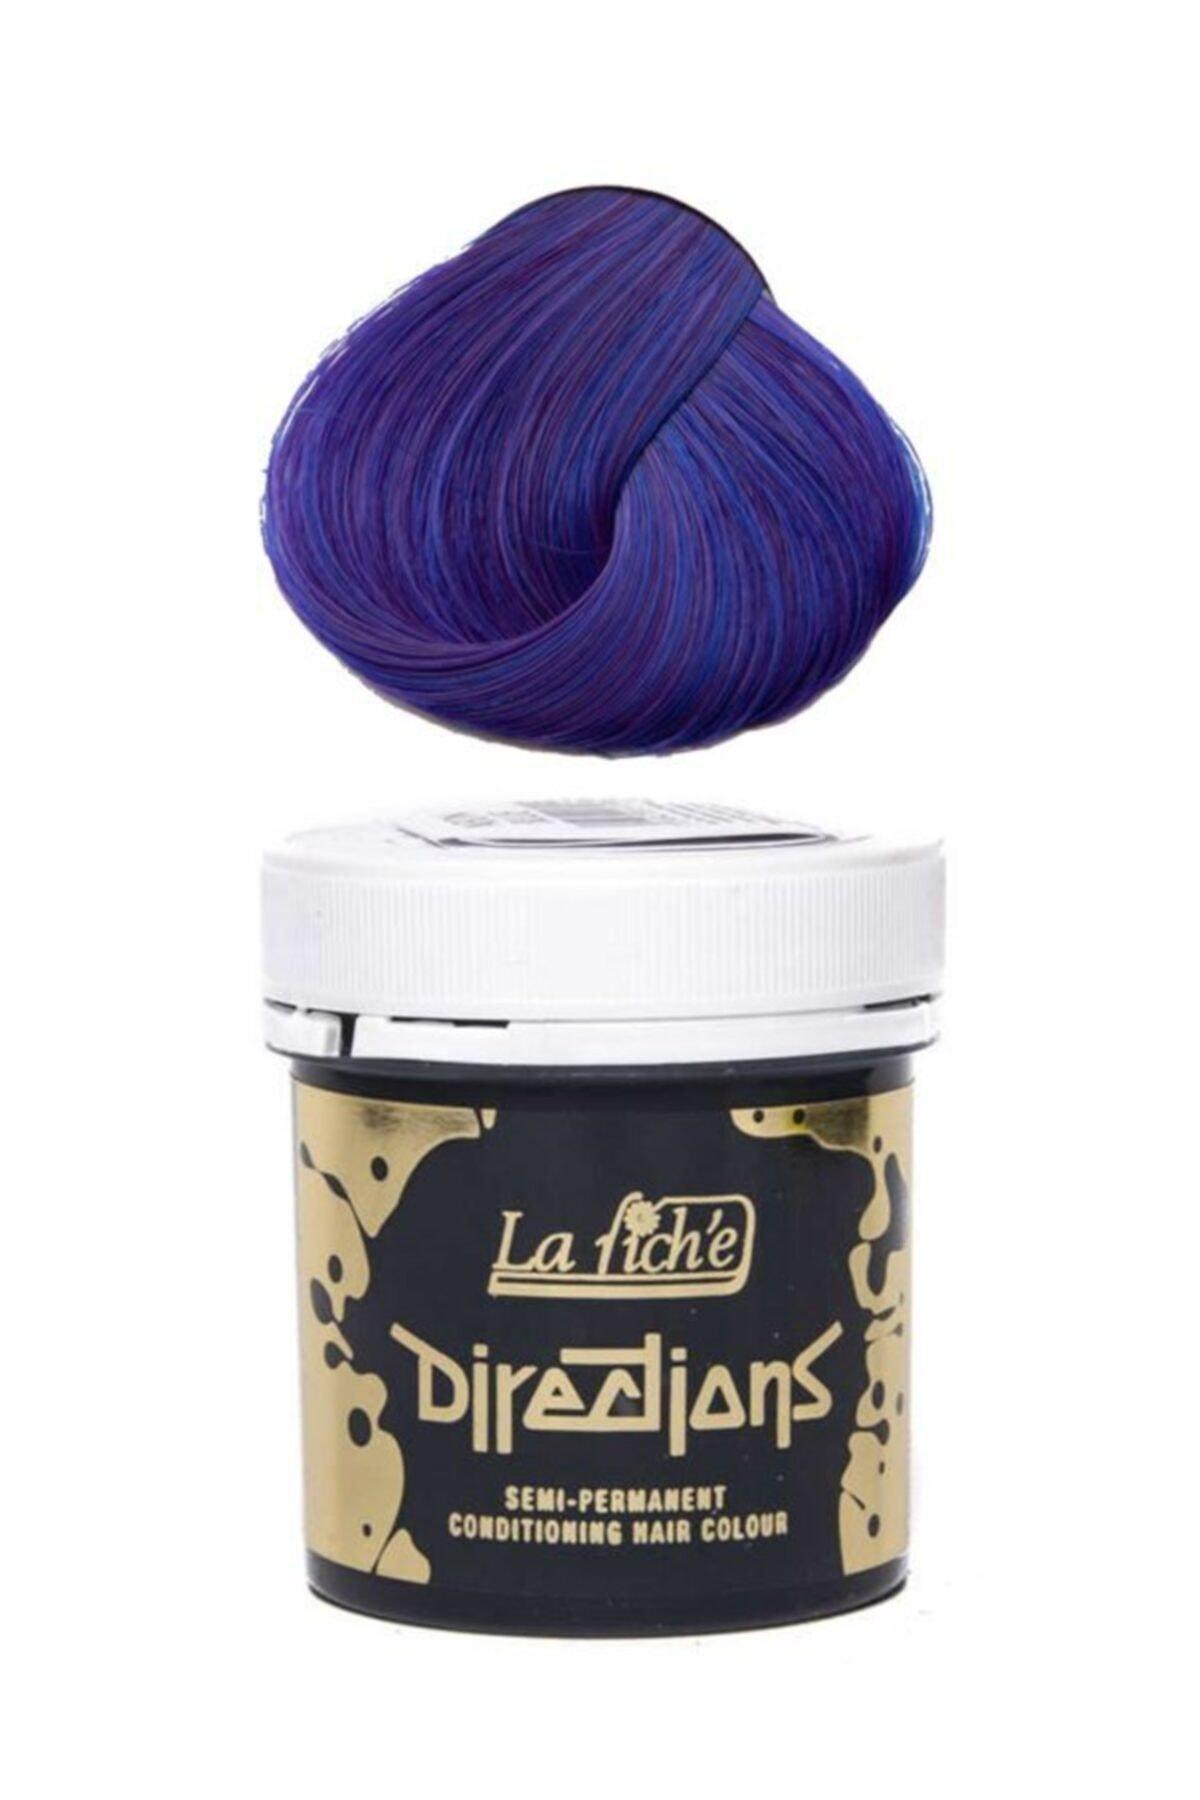 Köstebek La Riche Directions - Neon Blue Saç Boyası 88ml 1